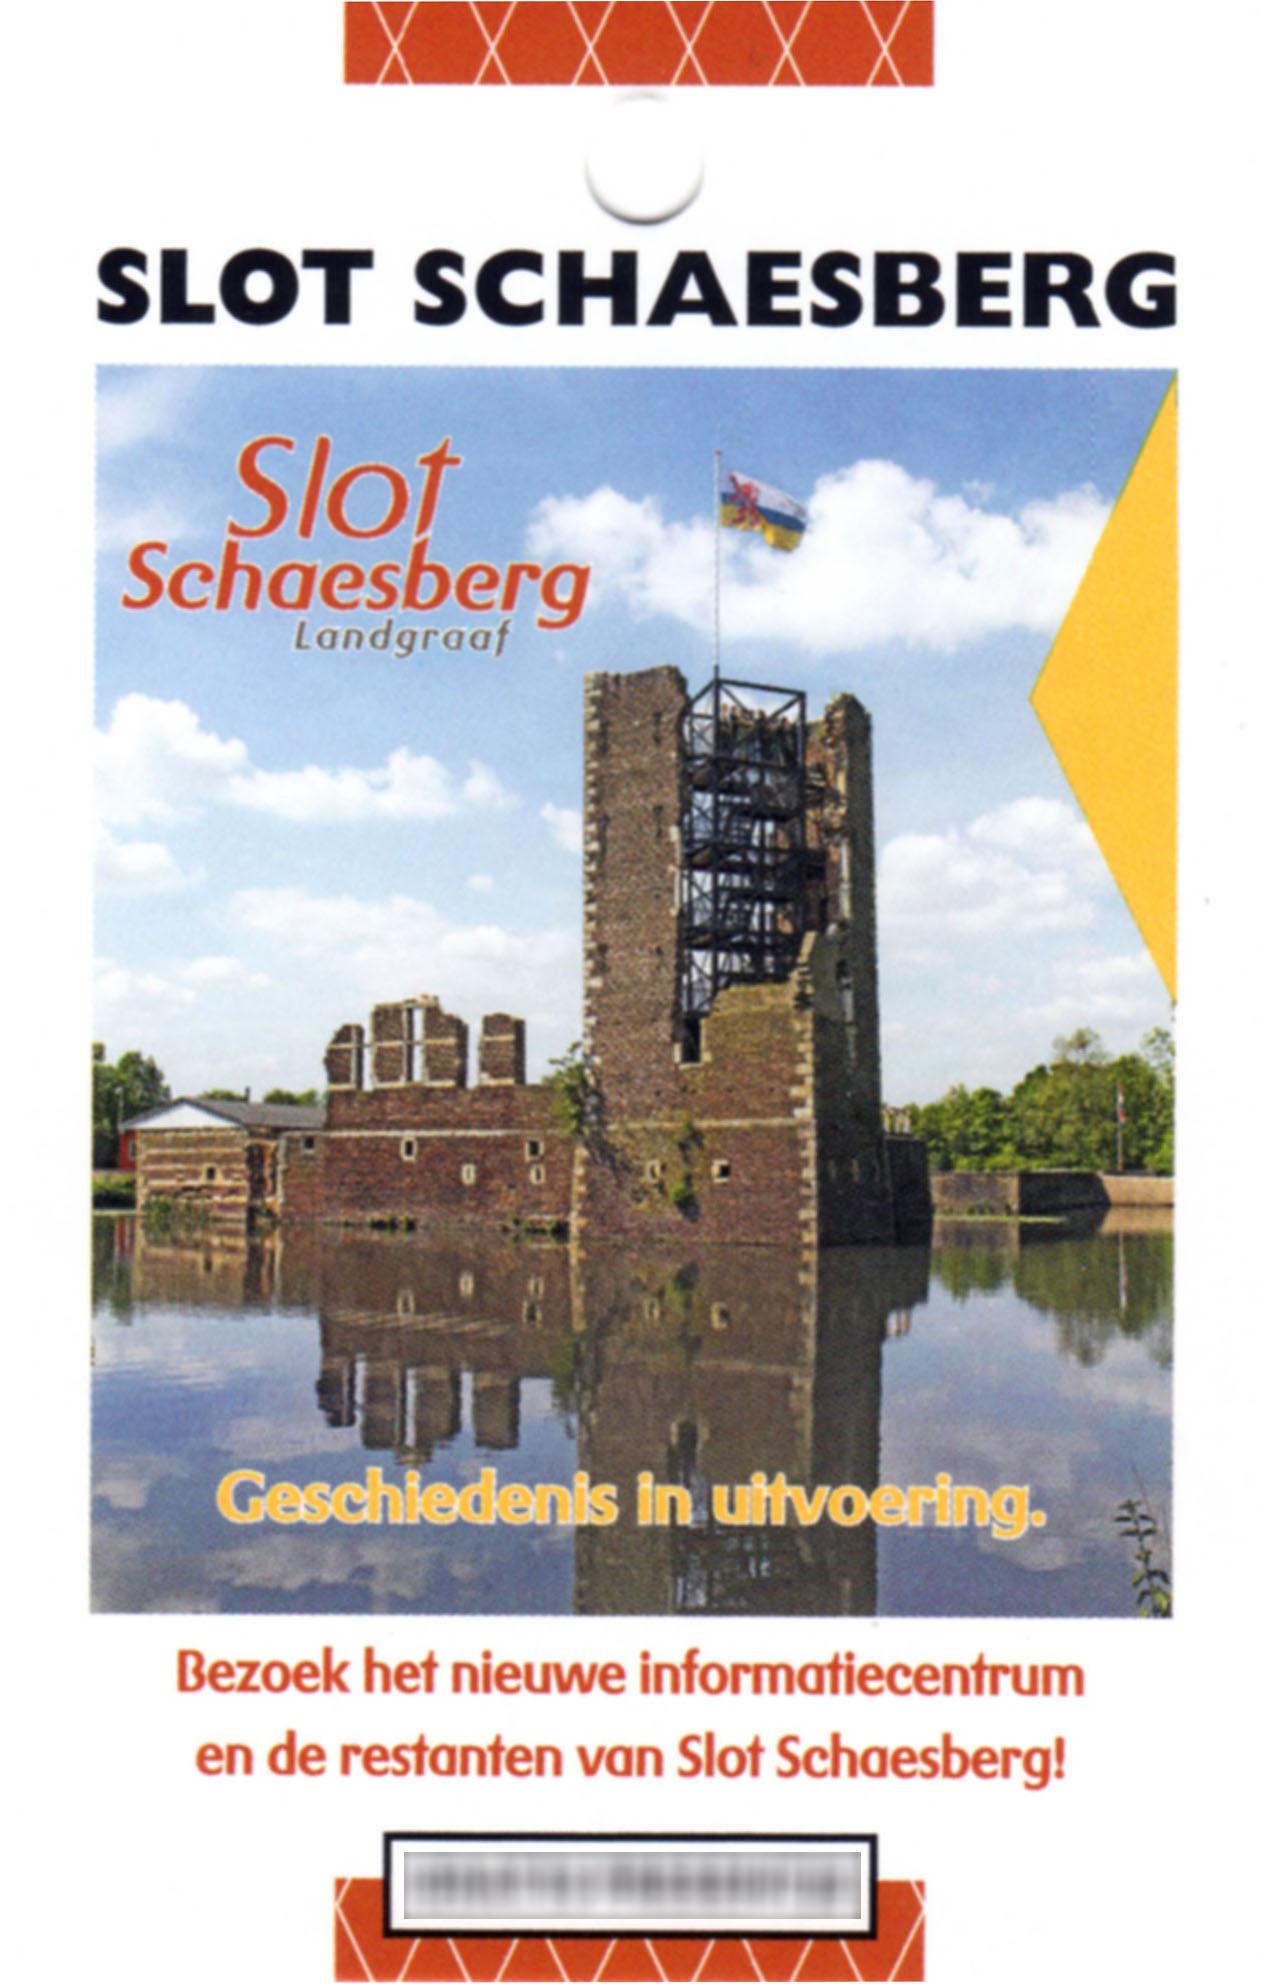 Slot Schaesberg Landgraaf